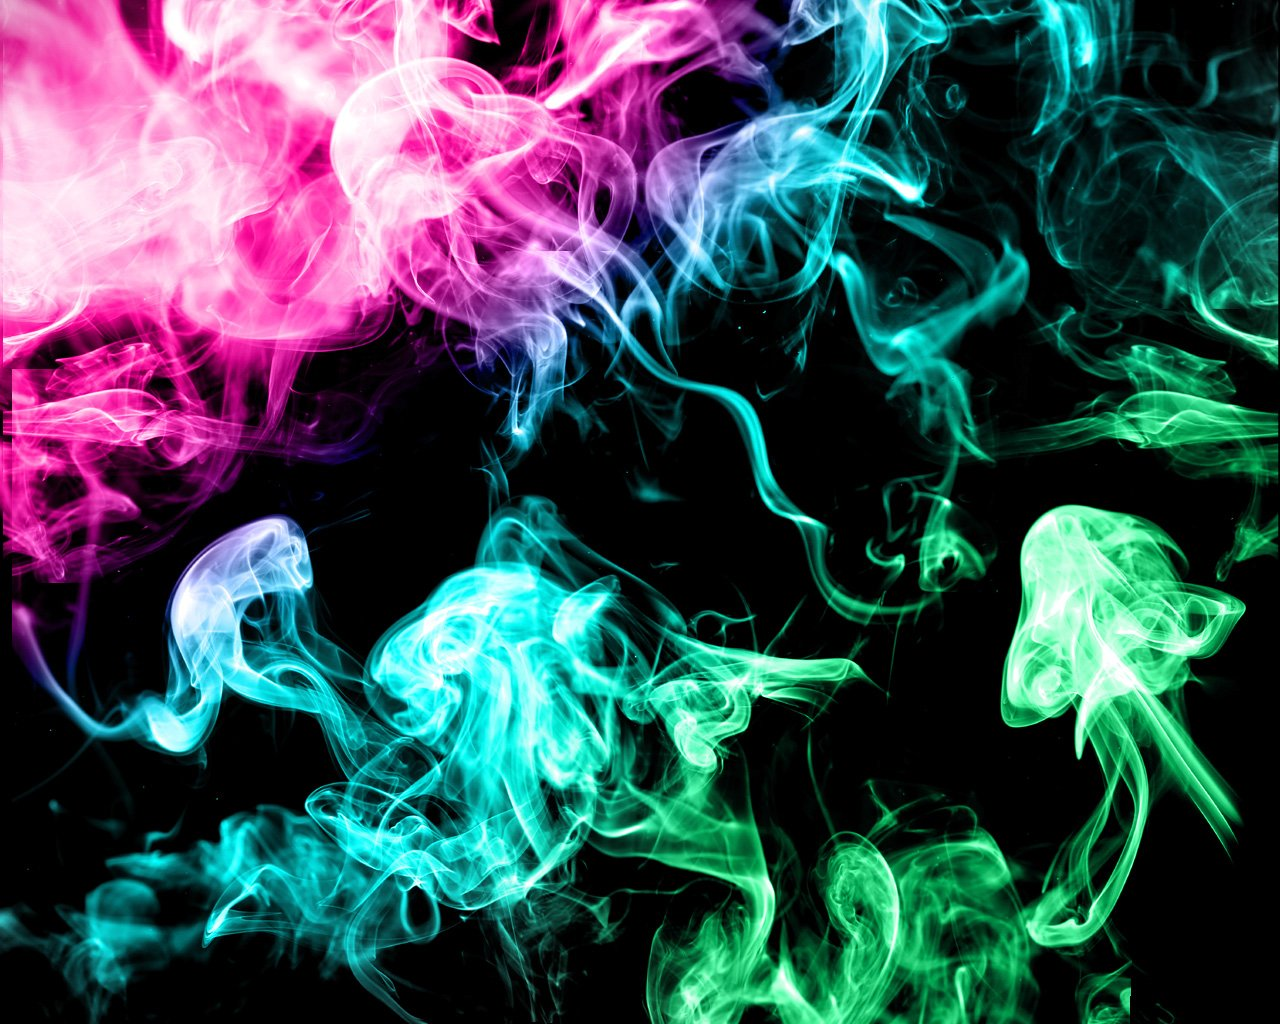 Colorful Smoke HD Wallpapers Colorful Smoke HD Wallpapers Check out 1280x1024